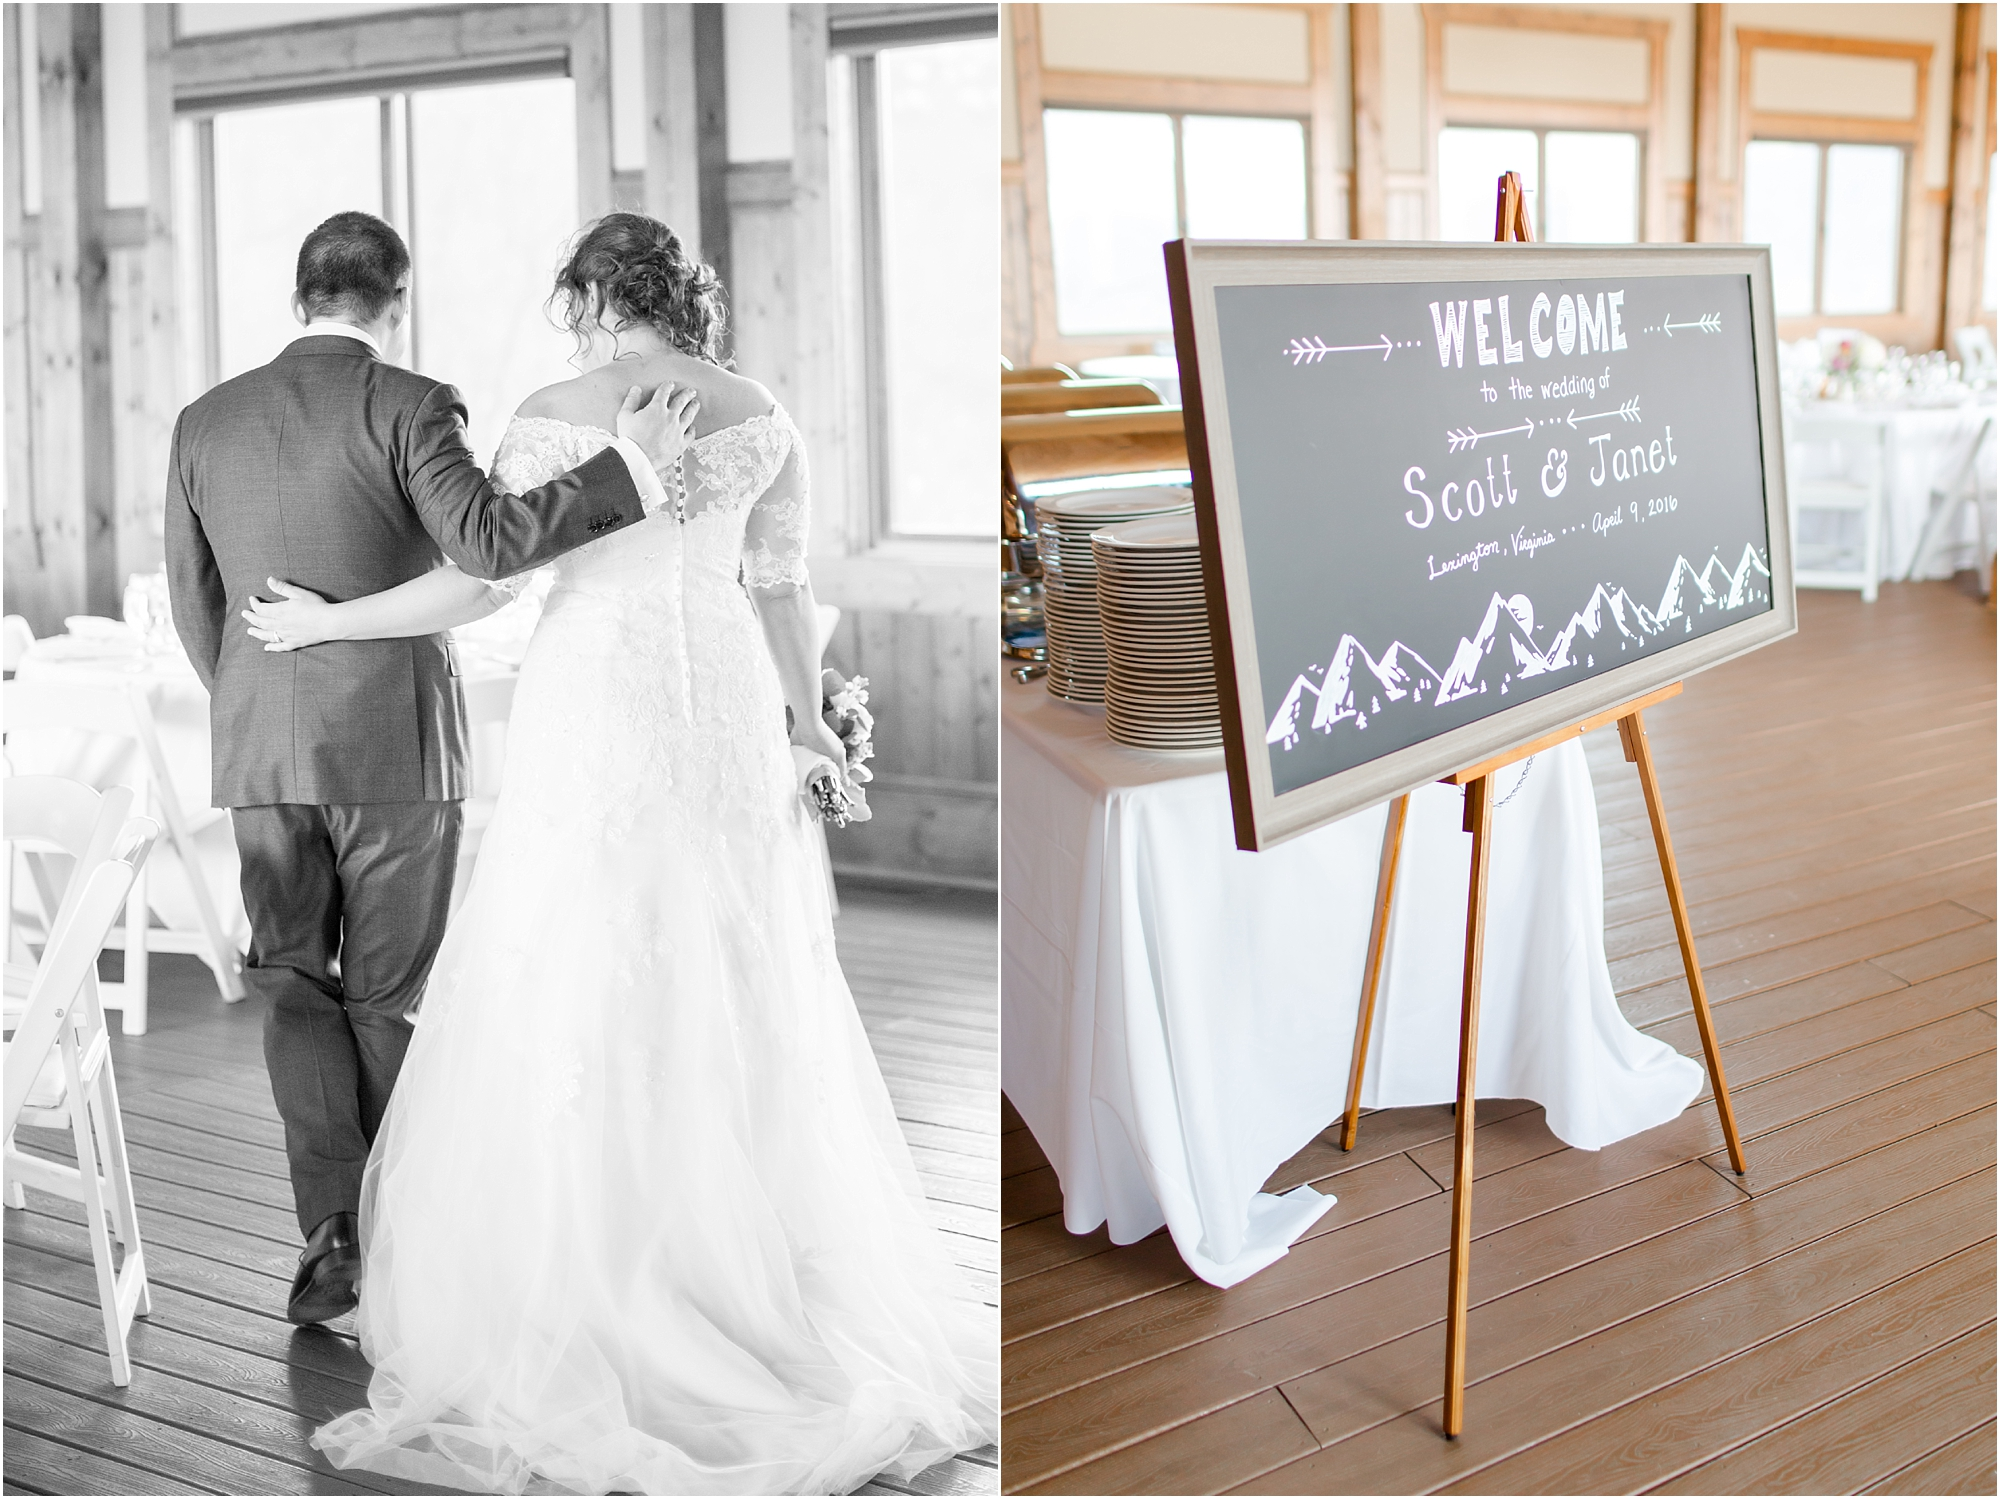 Simpson 4-Ceremony-693_anna grace photography virginia wedding photographer irvine estate photo.jpg